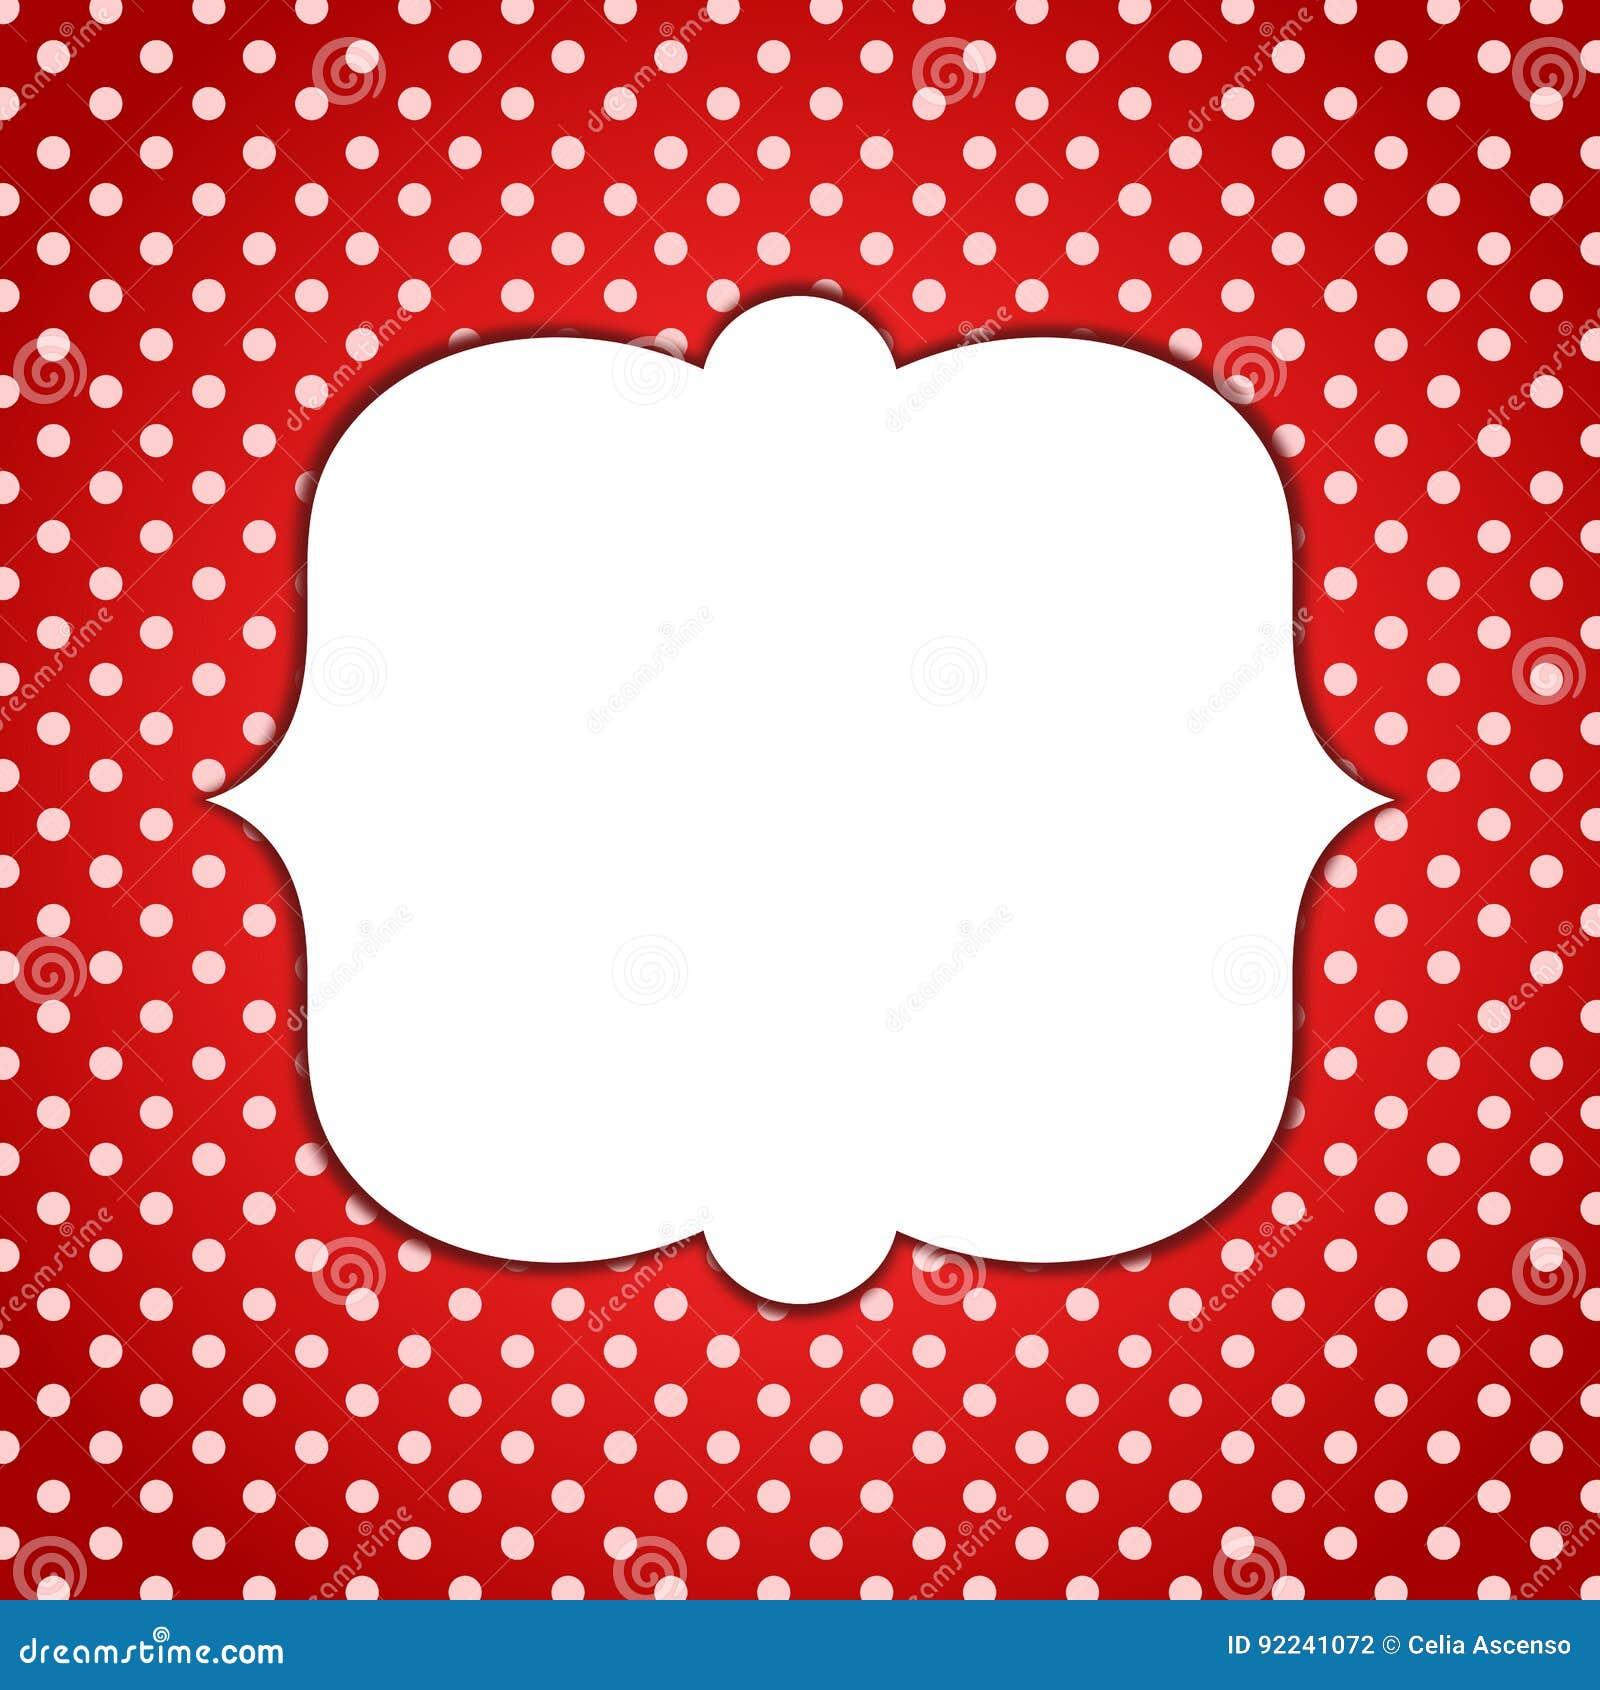 minnie red frame polka dots invitation card stock